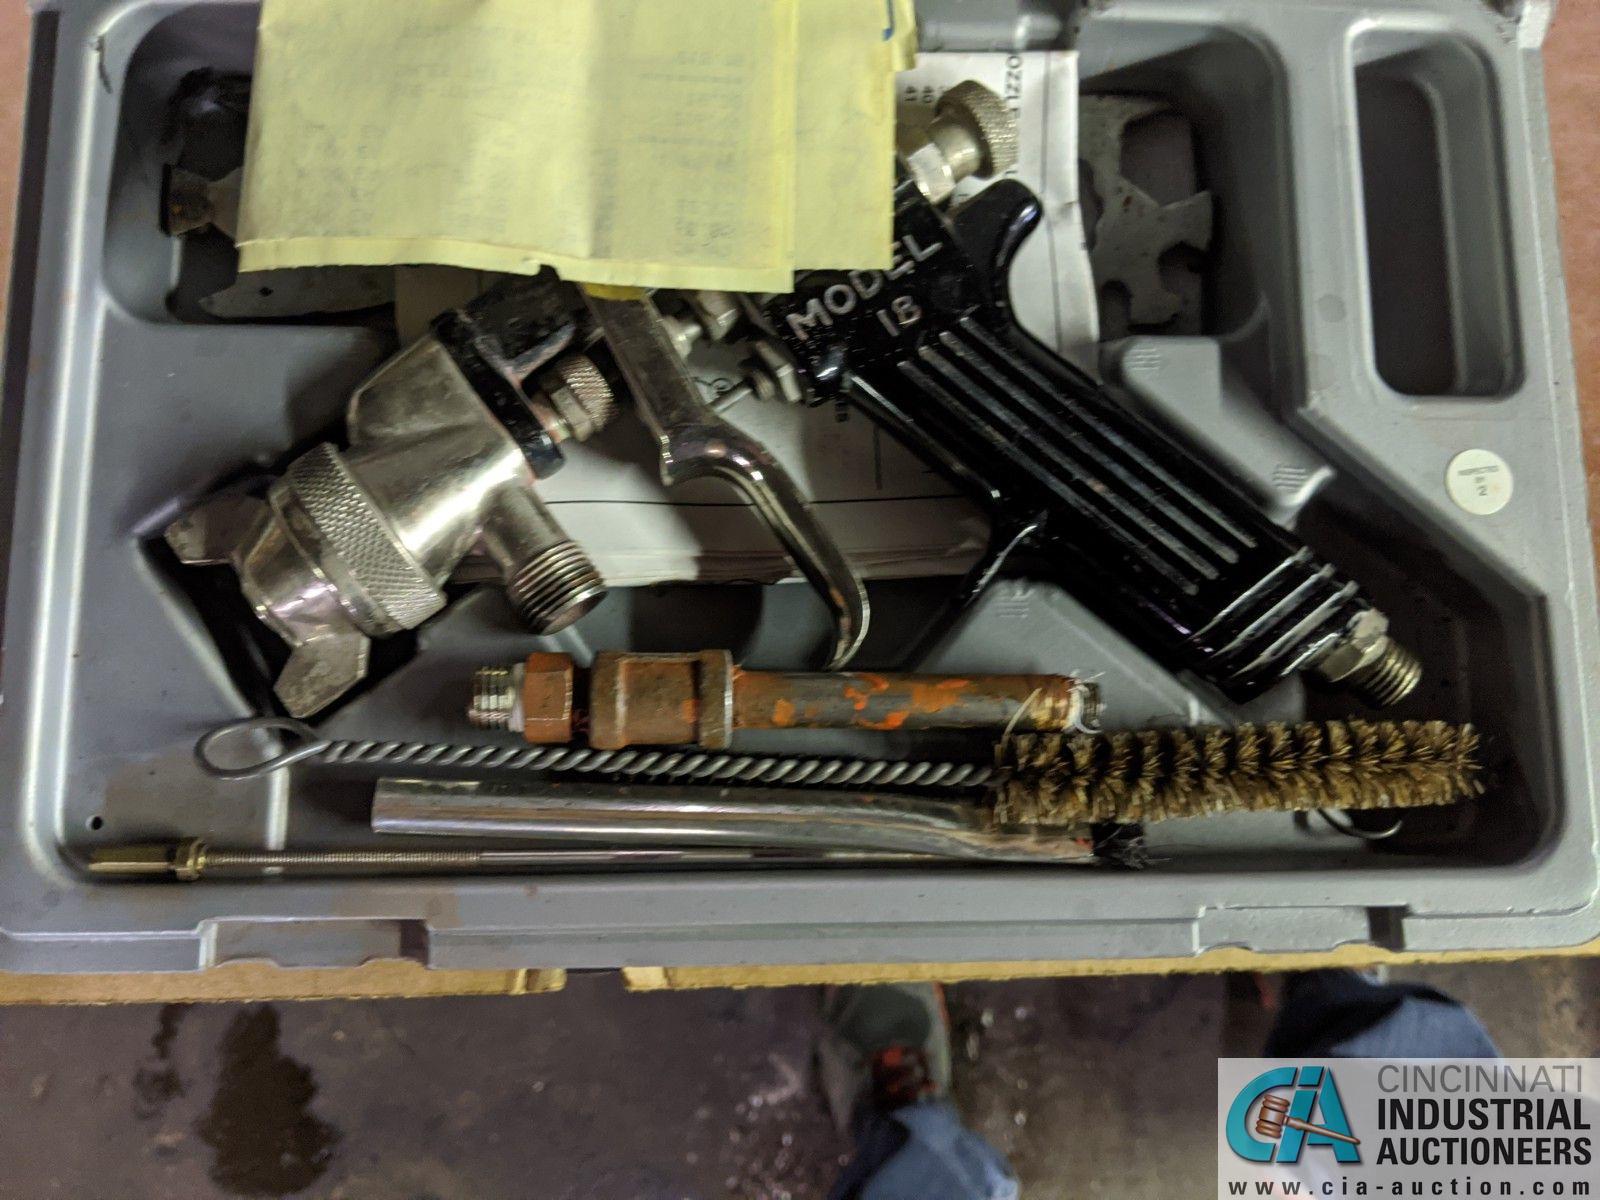 (LOT) 2M TK-6B CIRCUIT TRACER KIT AND BINKS MODEL 95 SPRAY GUN - Image 2 of 2